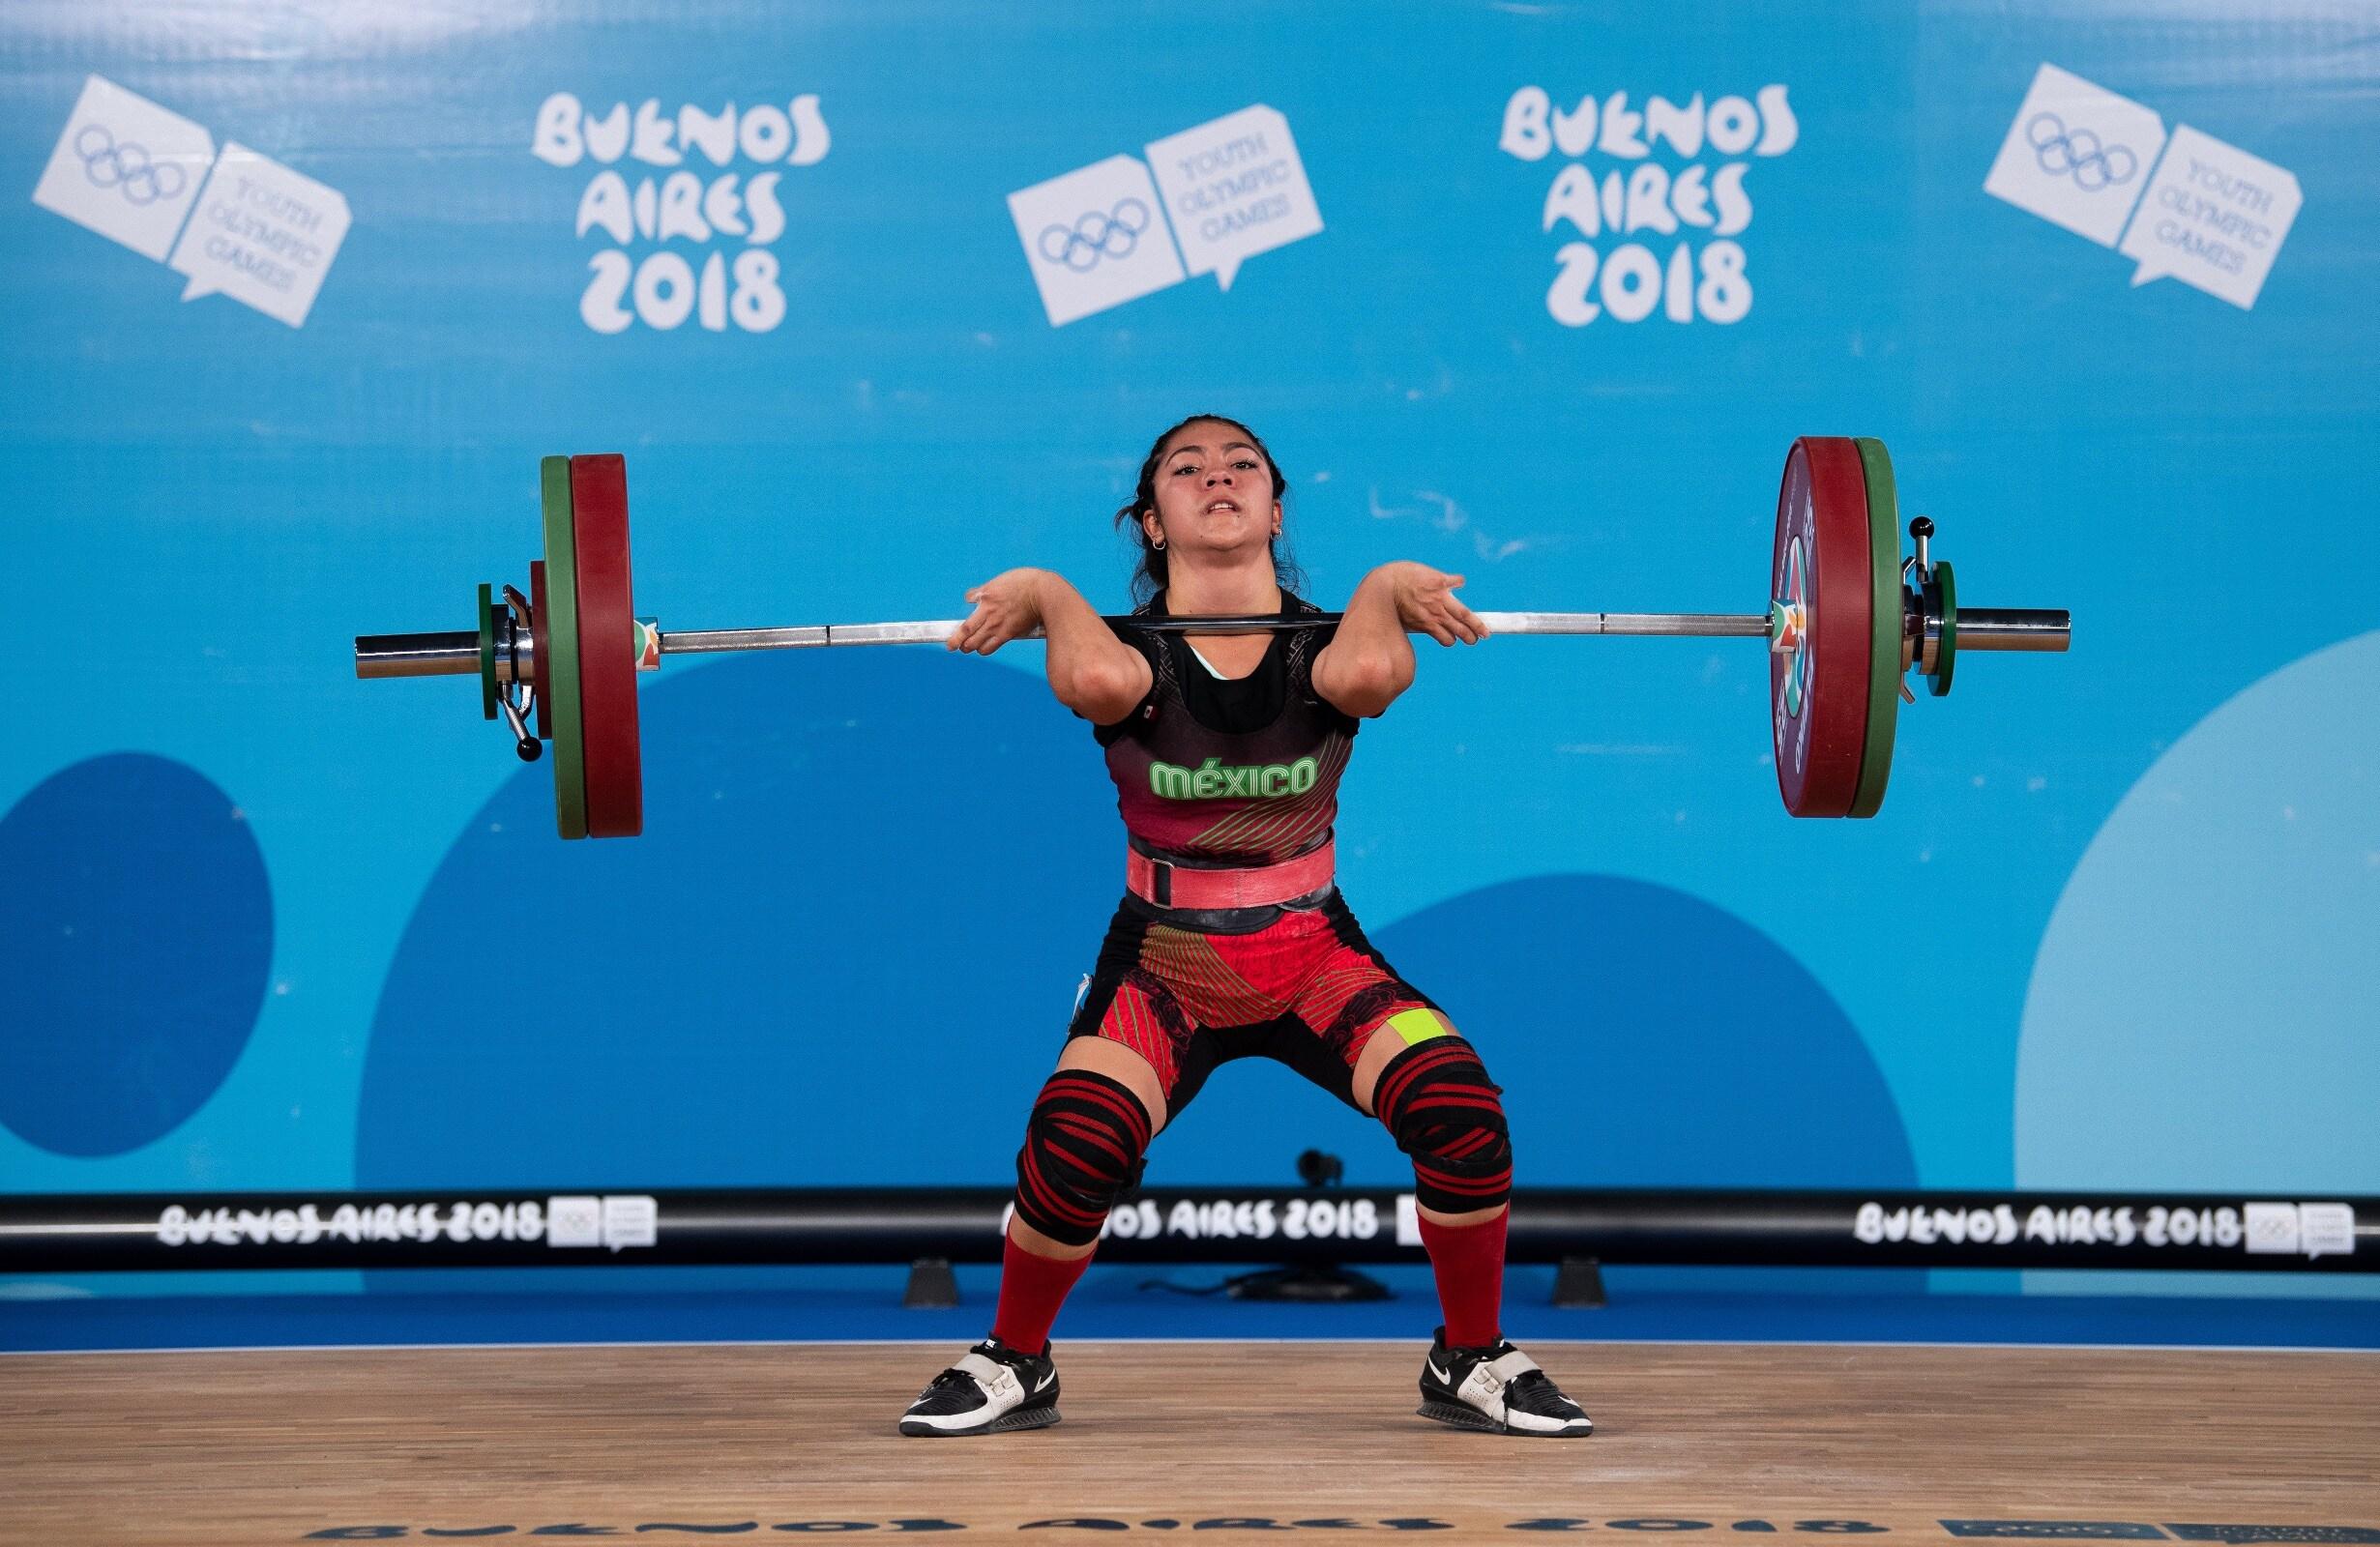 Buenos Aires 2018 - Haltérophilie - 48 kg femmes